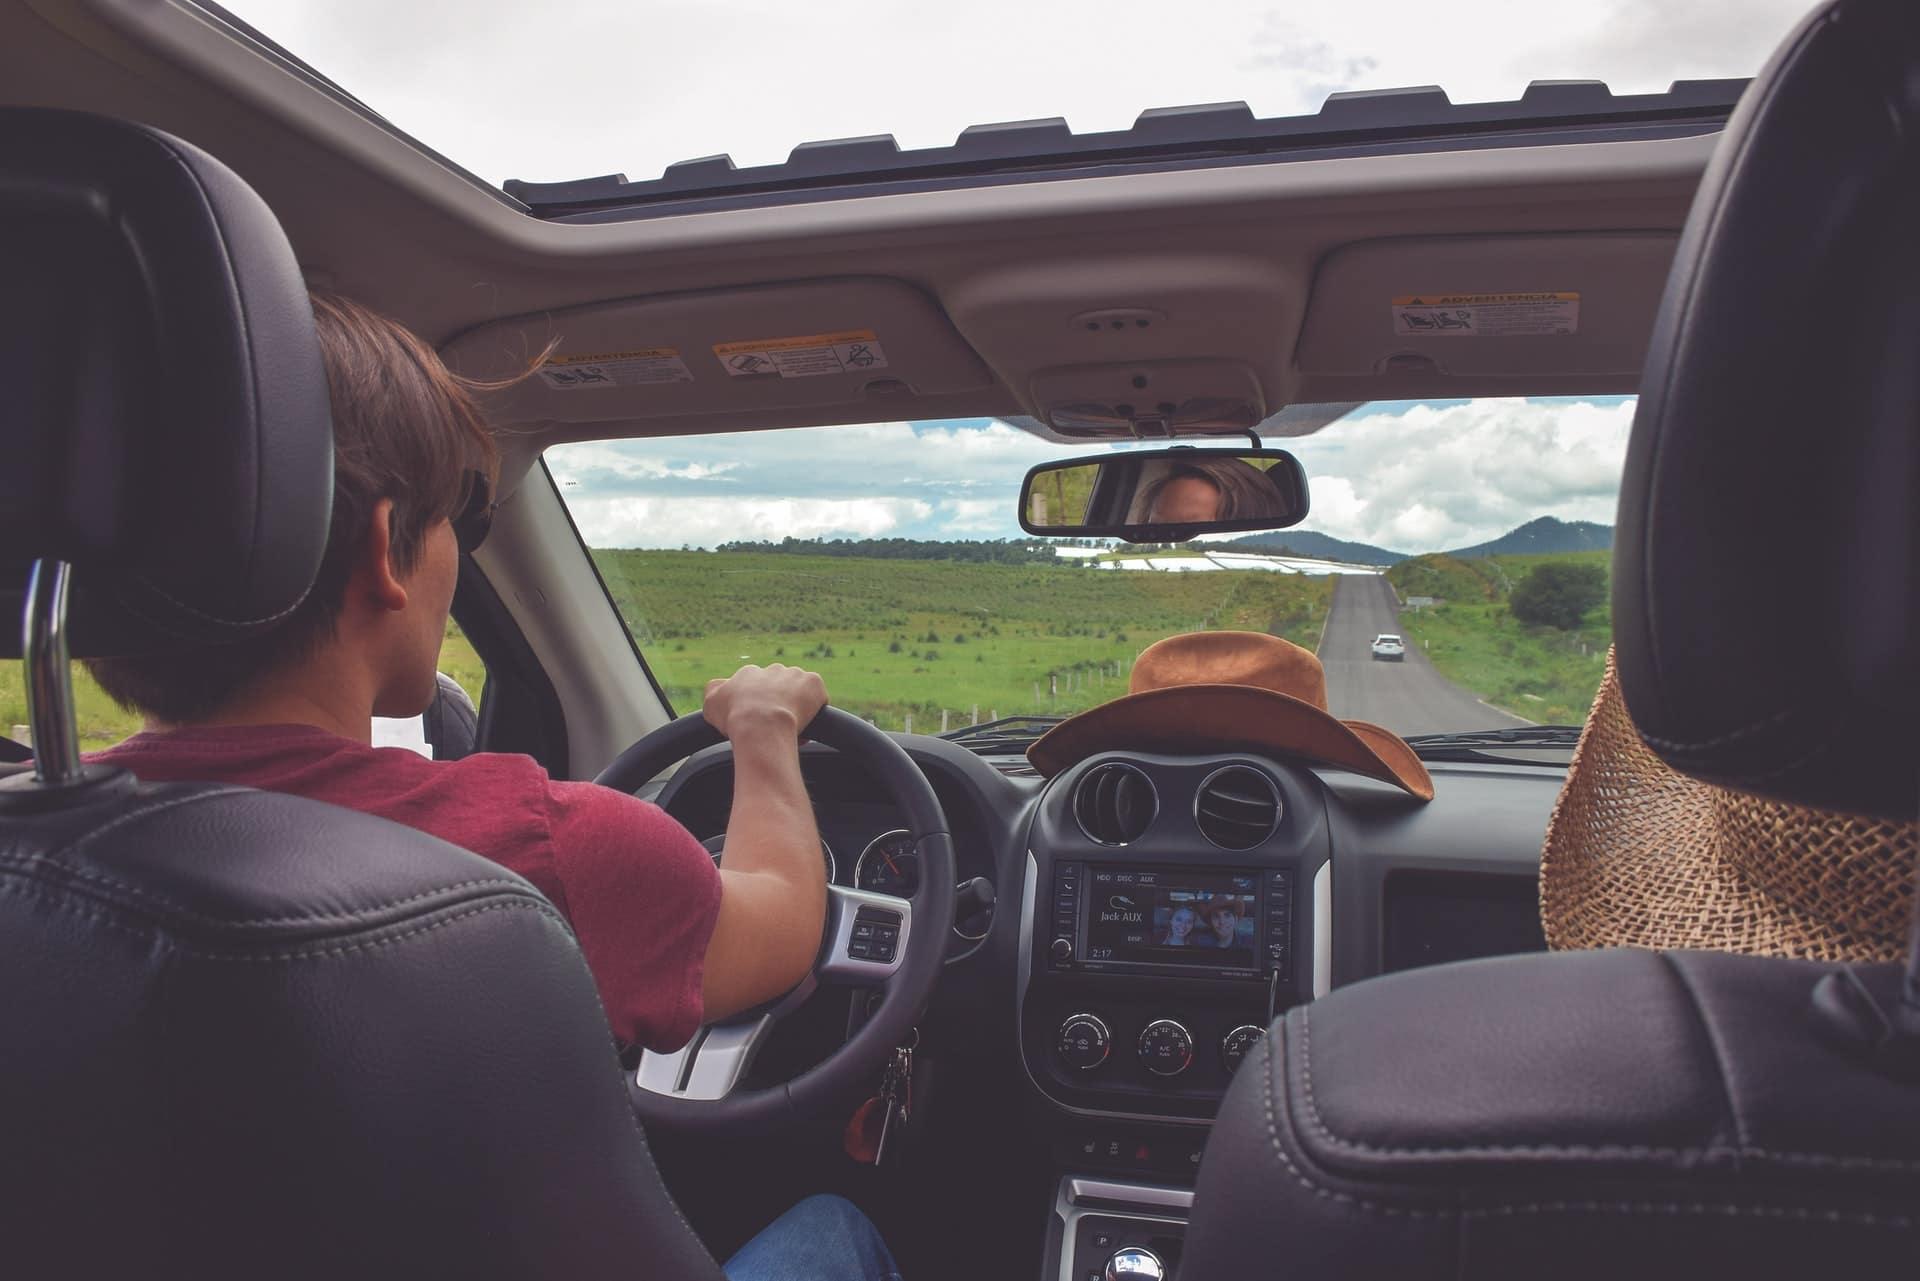 Ilustrasi seseorang sedang mengemudi mobil. Photo by Alex Jumper on Unsplash